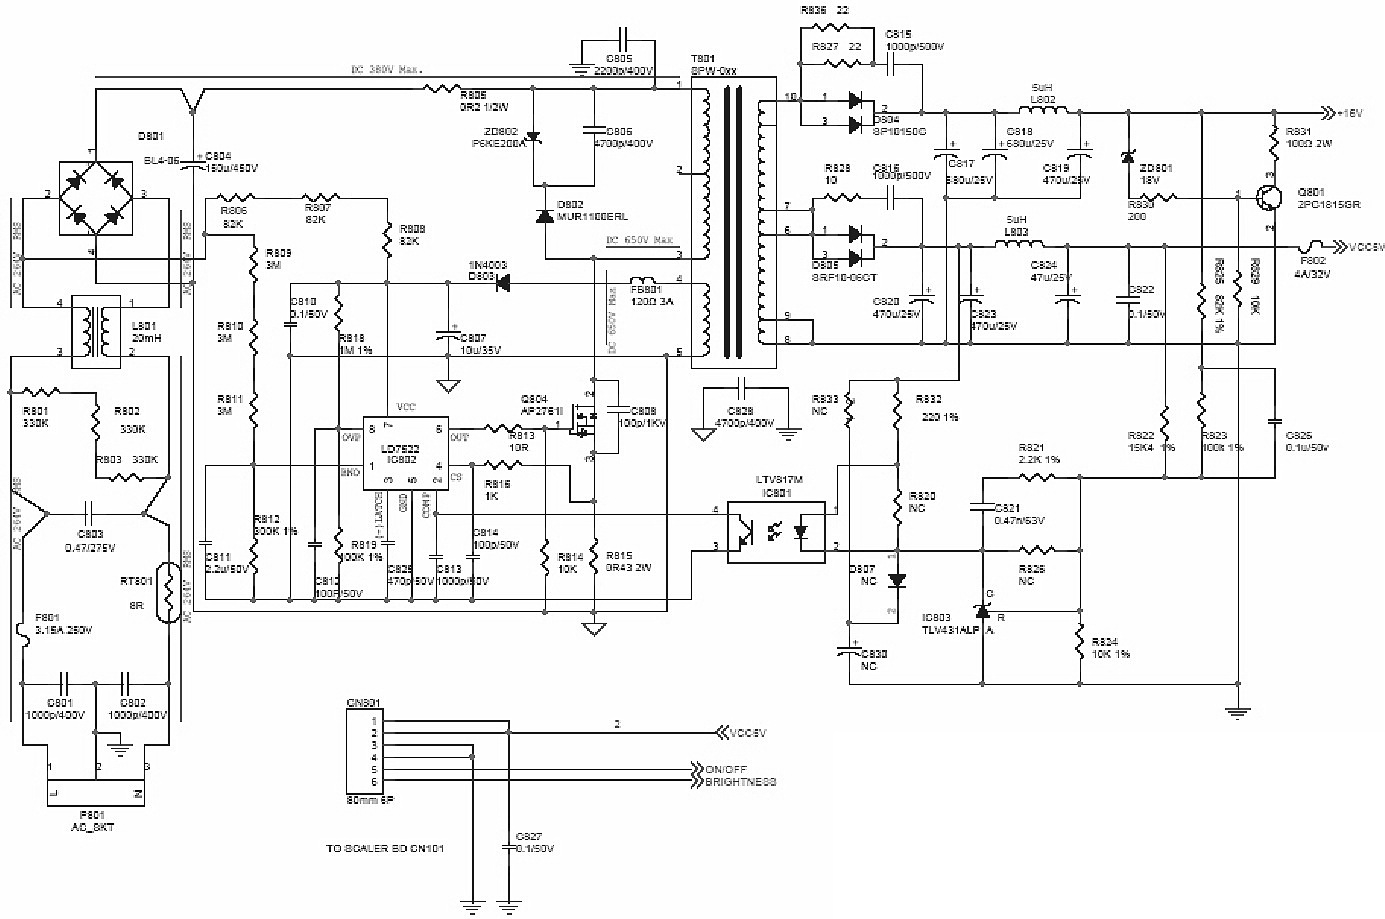 LG FLATRON W2234SSNI W2234SBNI LCD MONITOR SMPS